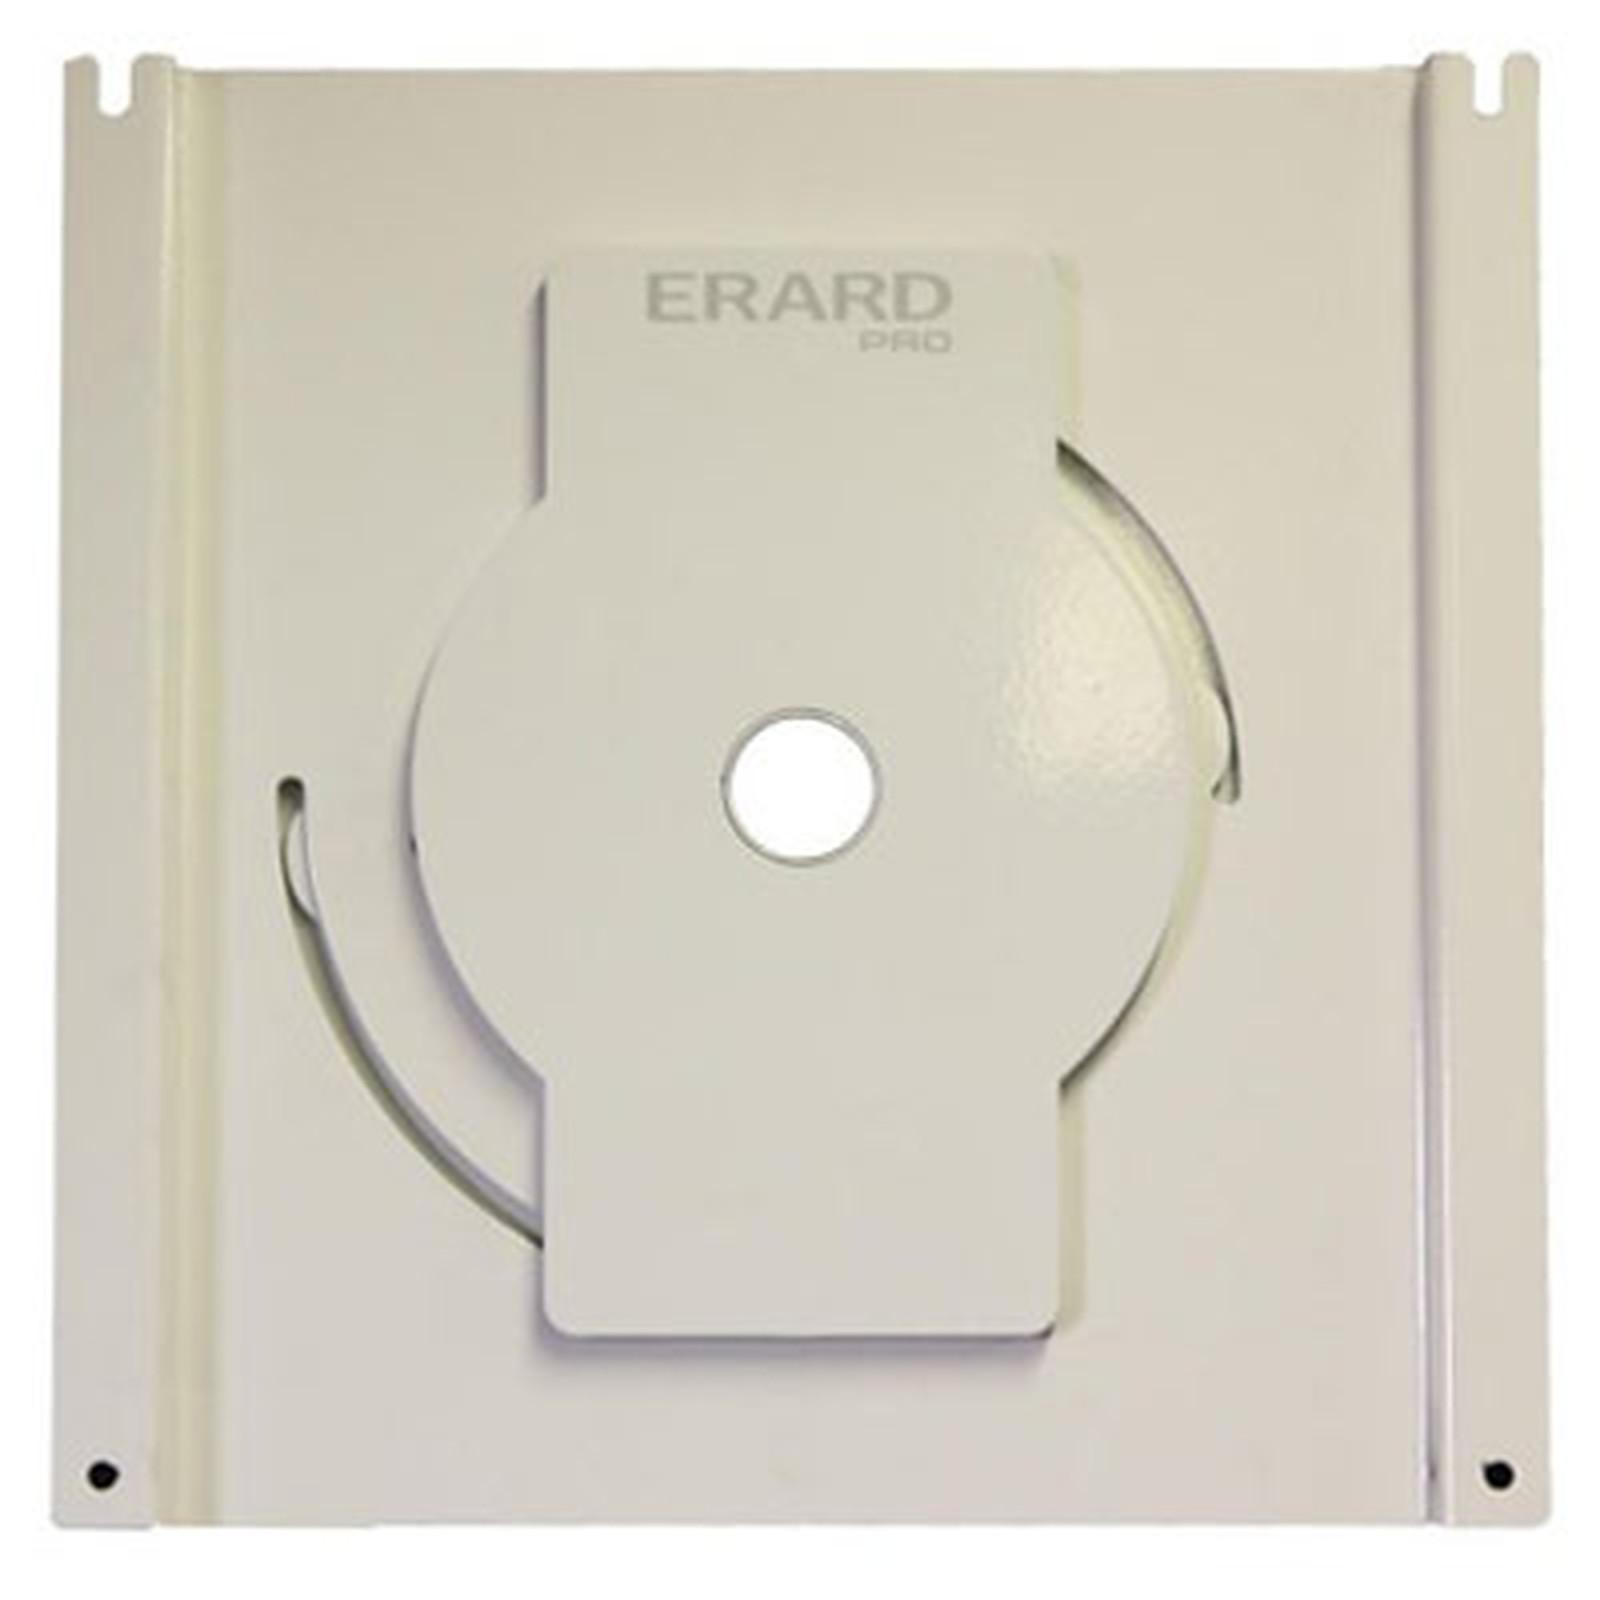 ERARD Pro Support Mural Flip